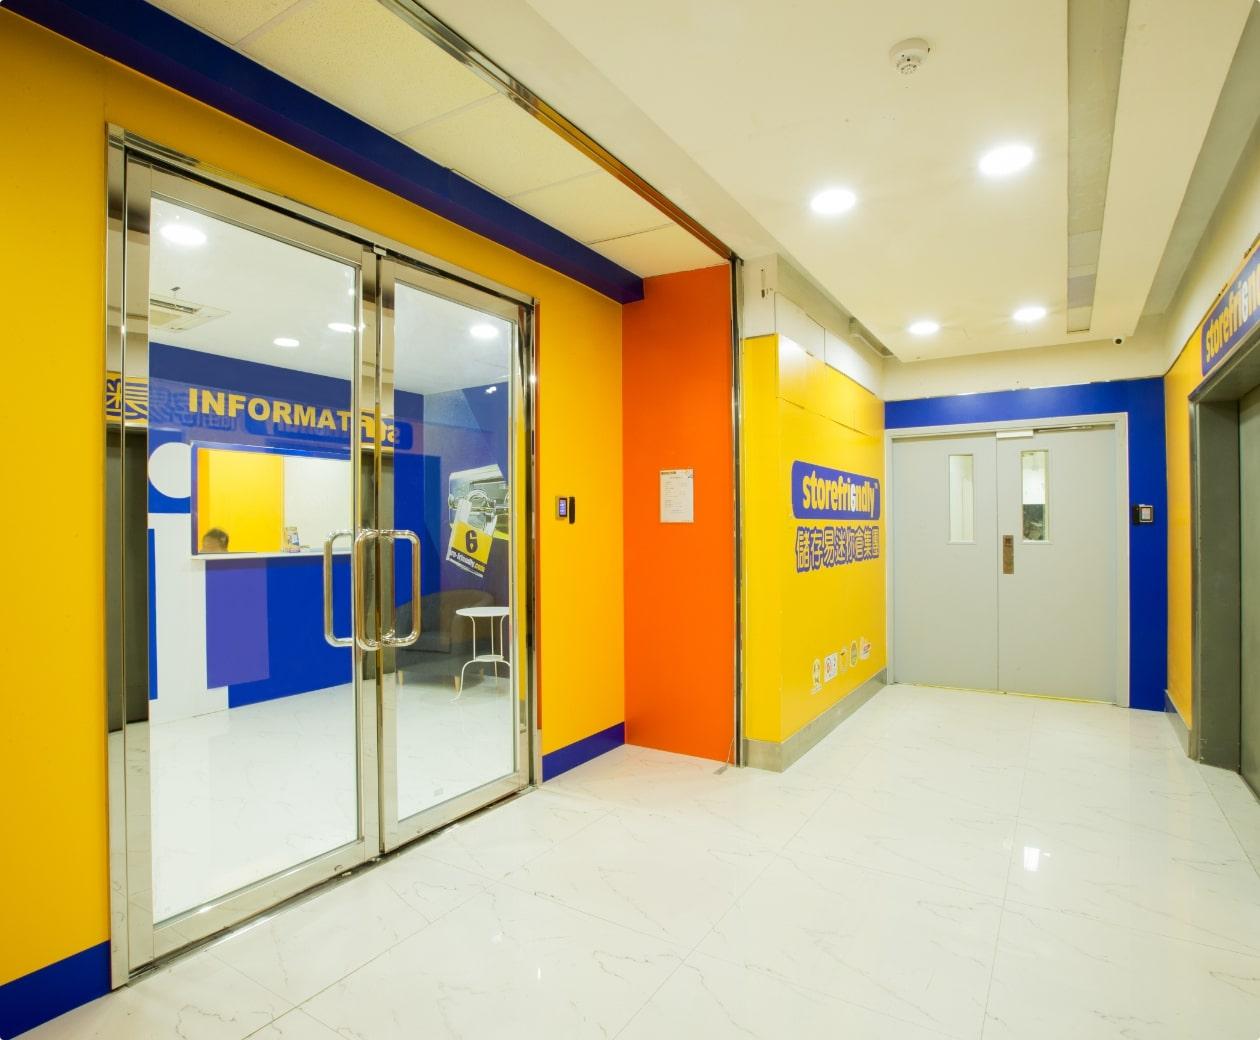 Entrance to Storefriendly storage facility